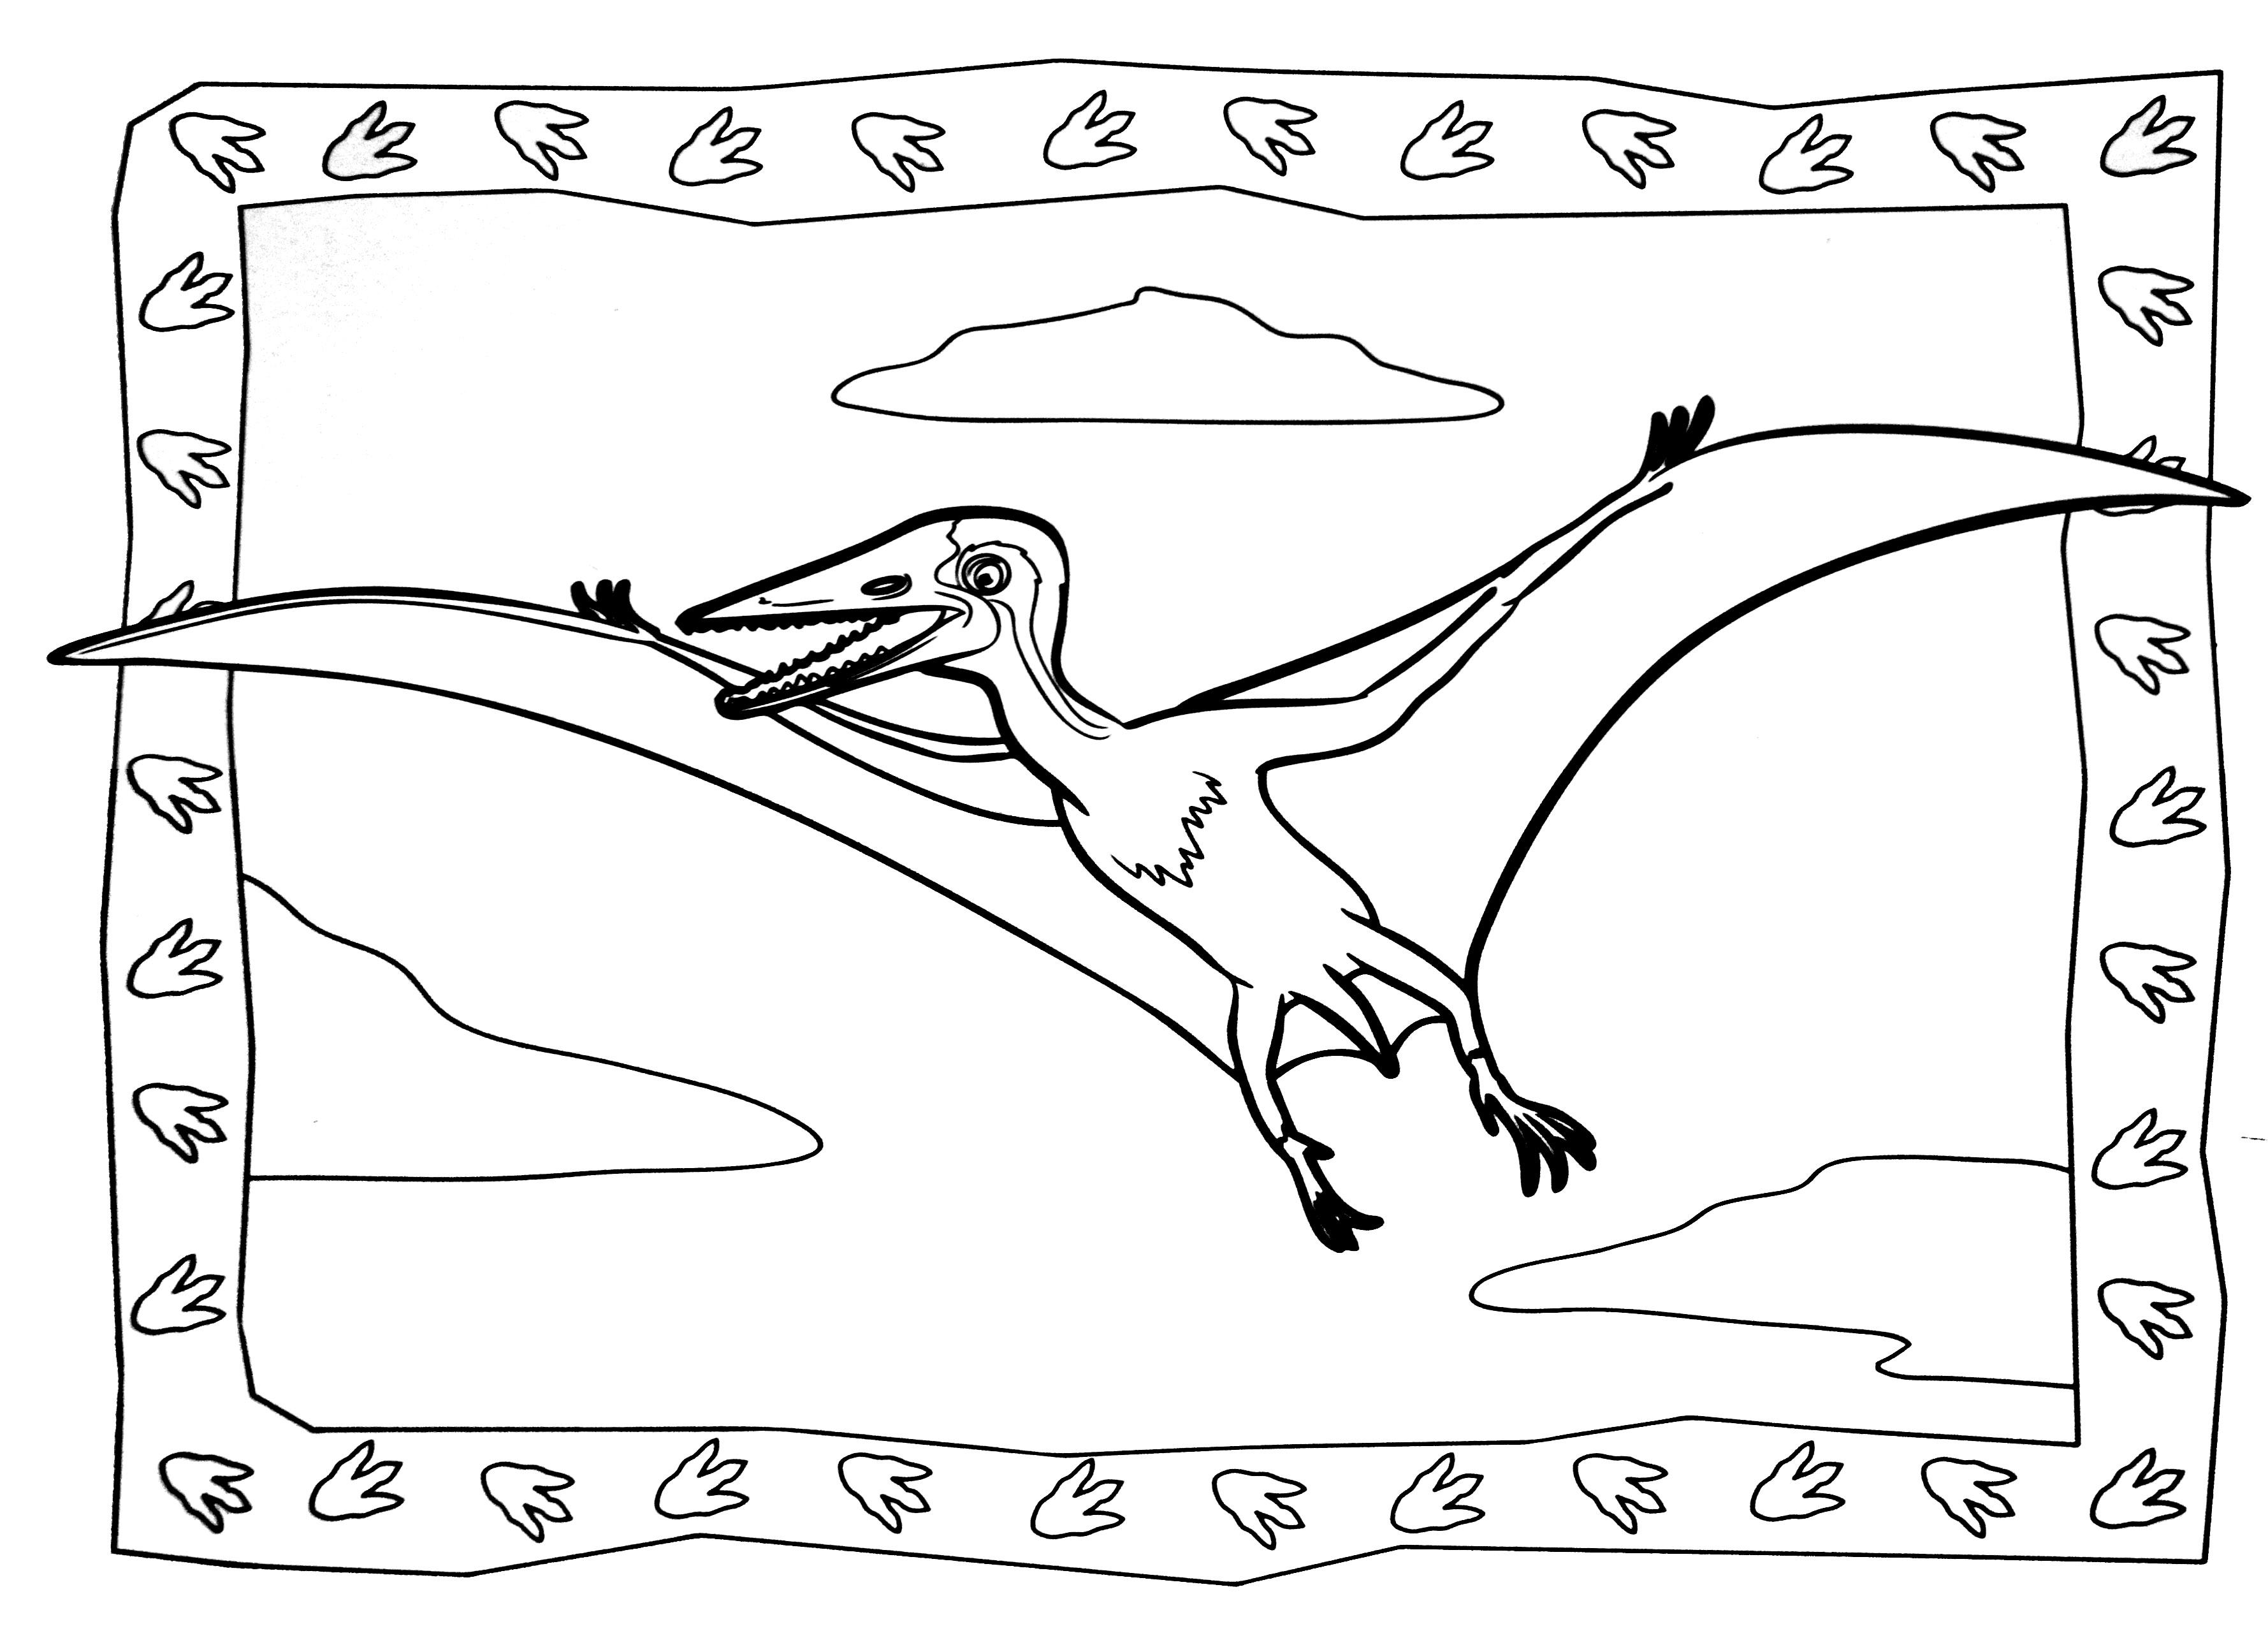 A imprimer dinosaure 7 coloriages de dinosaures - Coloriage de dinosaures ...